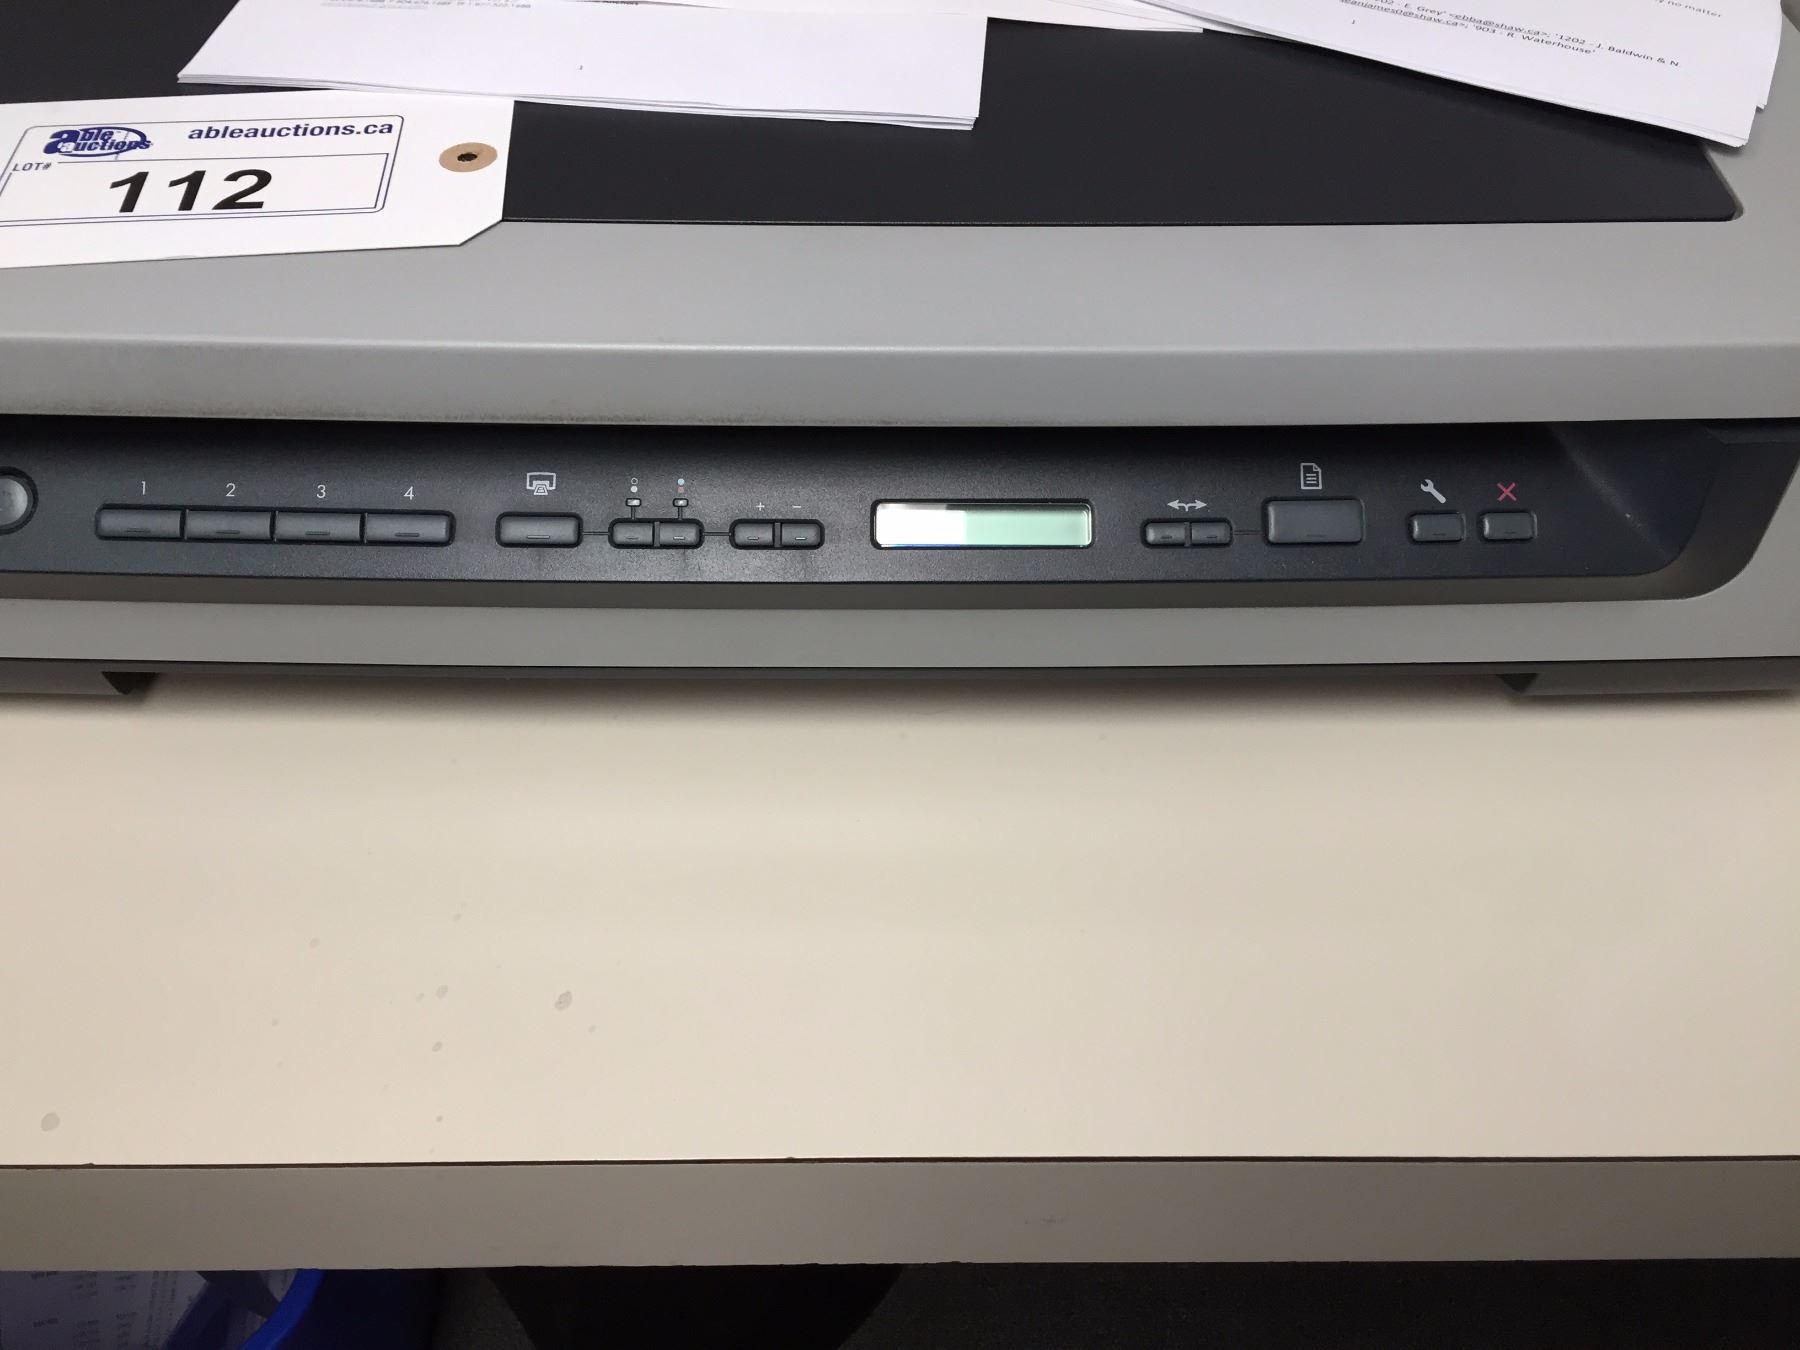 HP 8300 SCANNER DRIVER WINDOWS XP